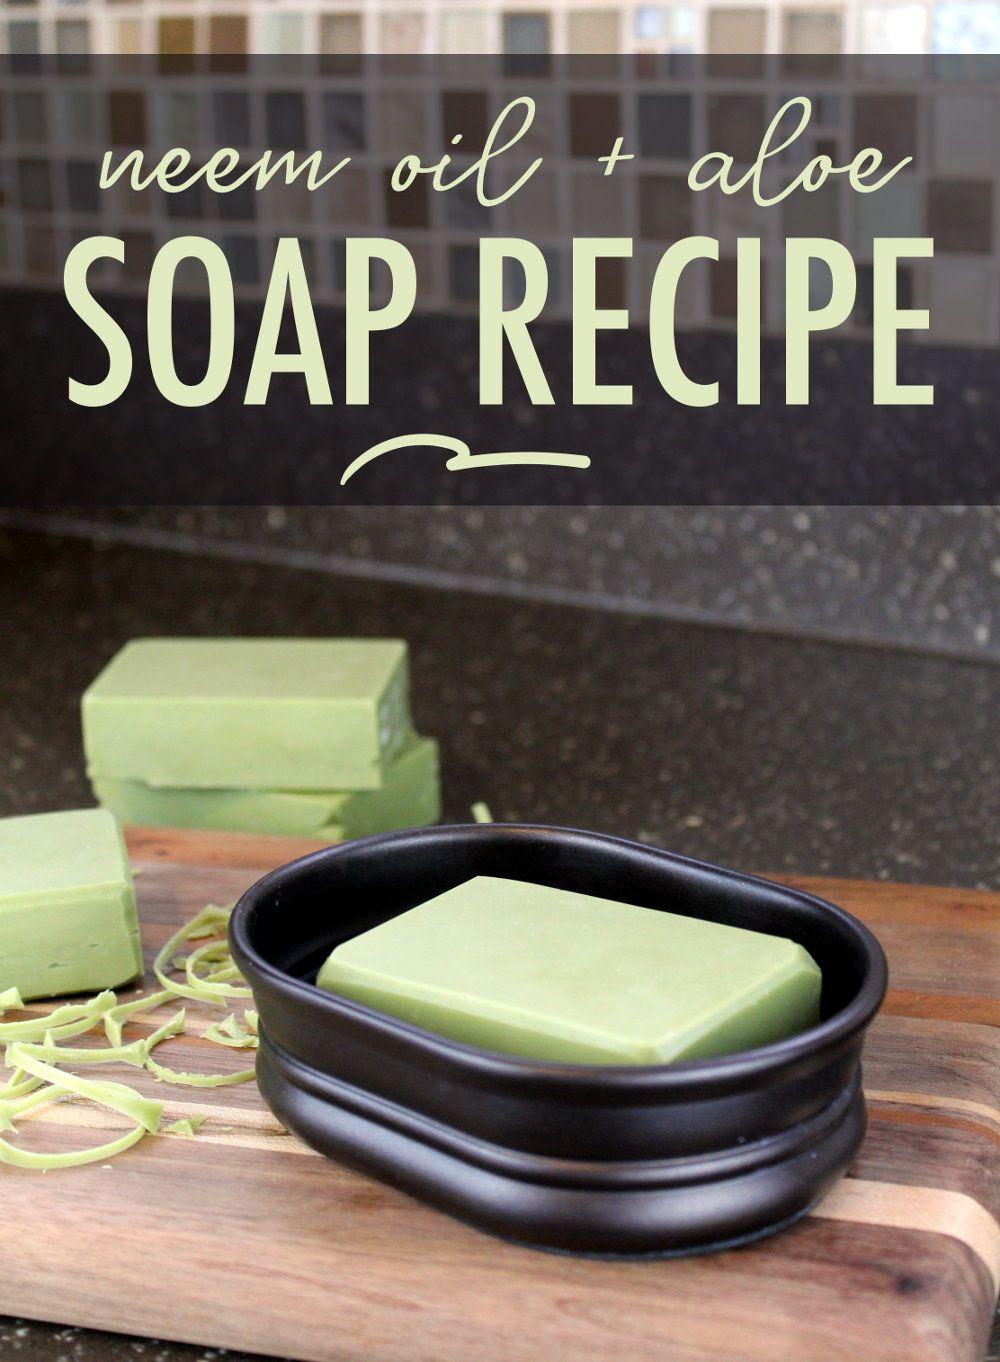 Aloe Vera Soap Recipe With Neem Oil Soap Recipes Cold Process Soap Recipes Natural Soaps Recipes